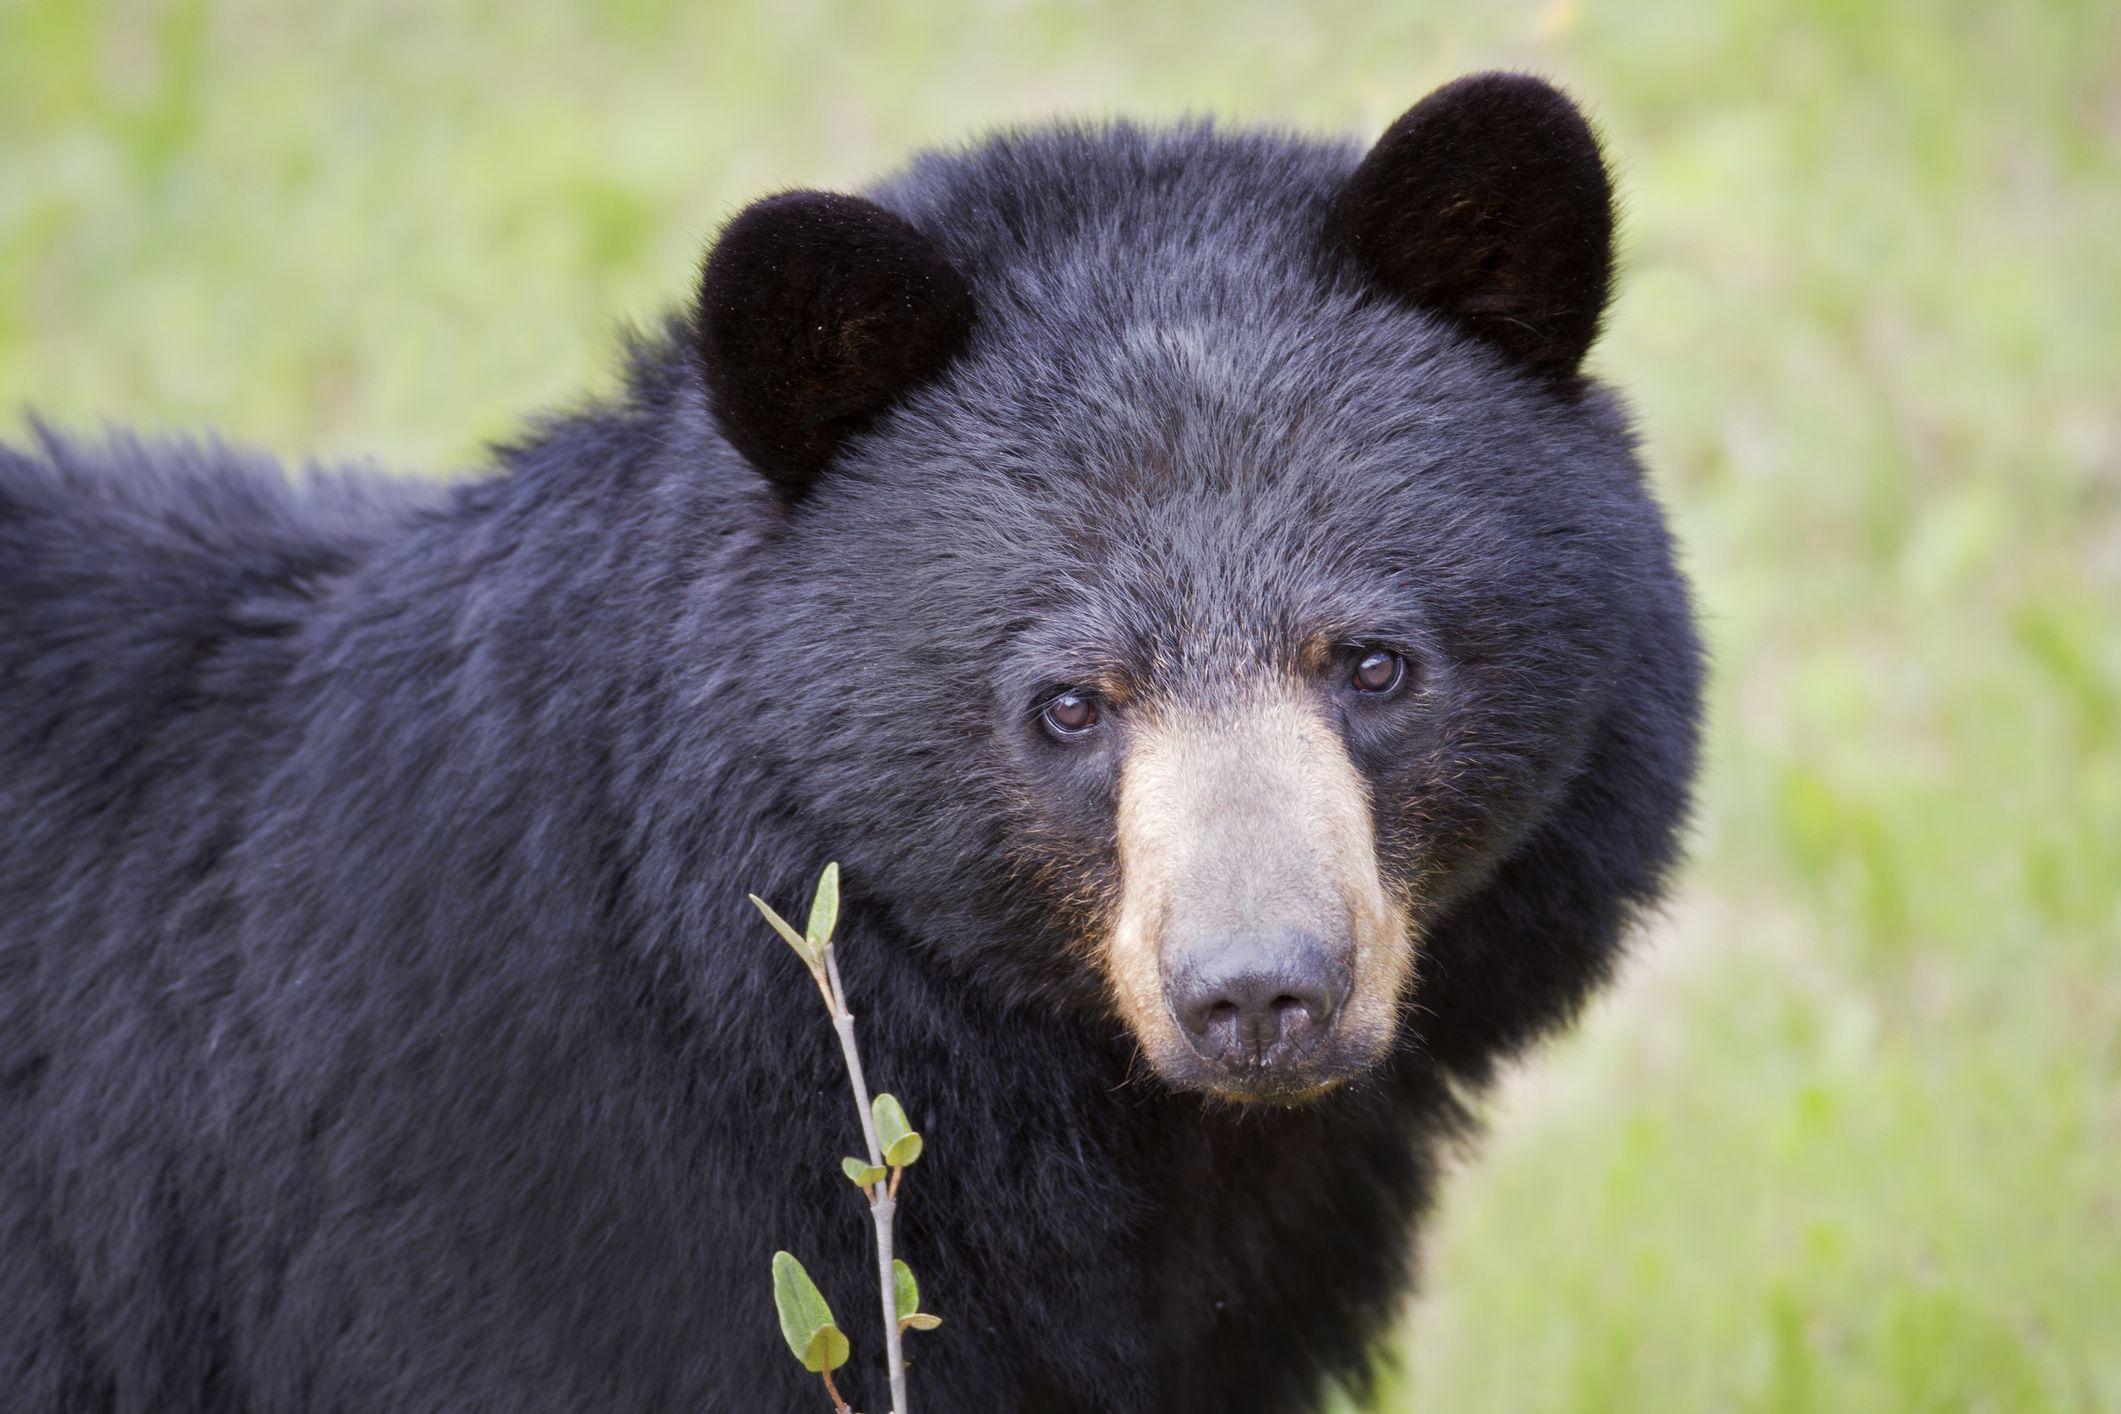 Pennsylvania Woman In Critical Condition After Bear